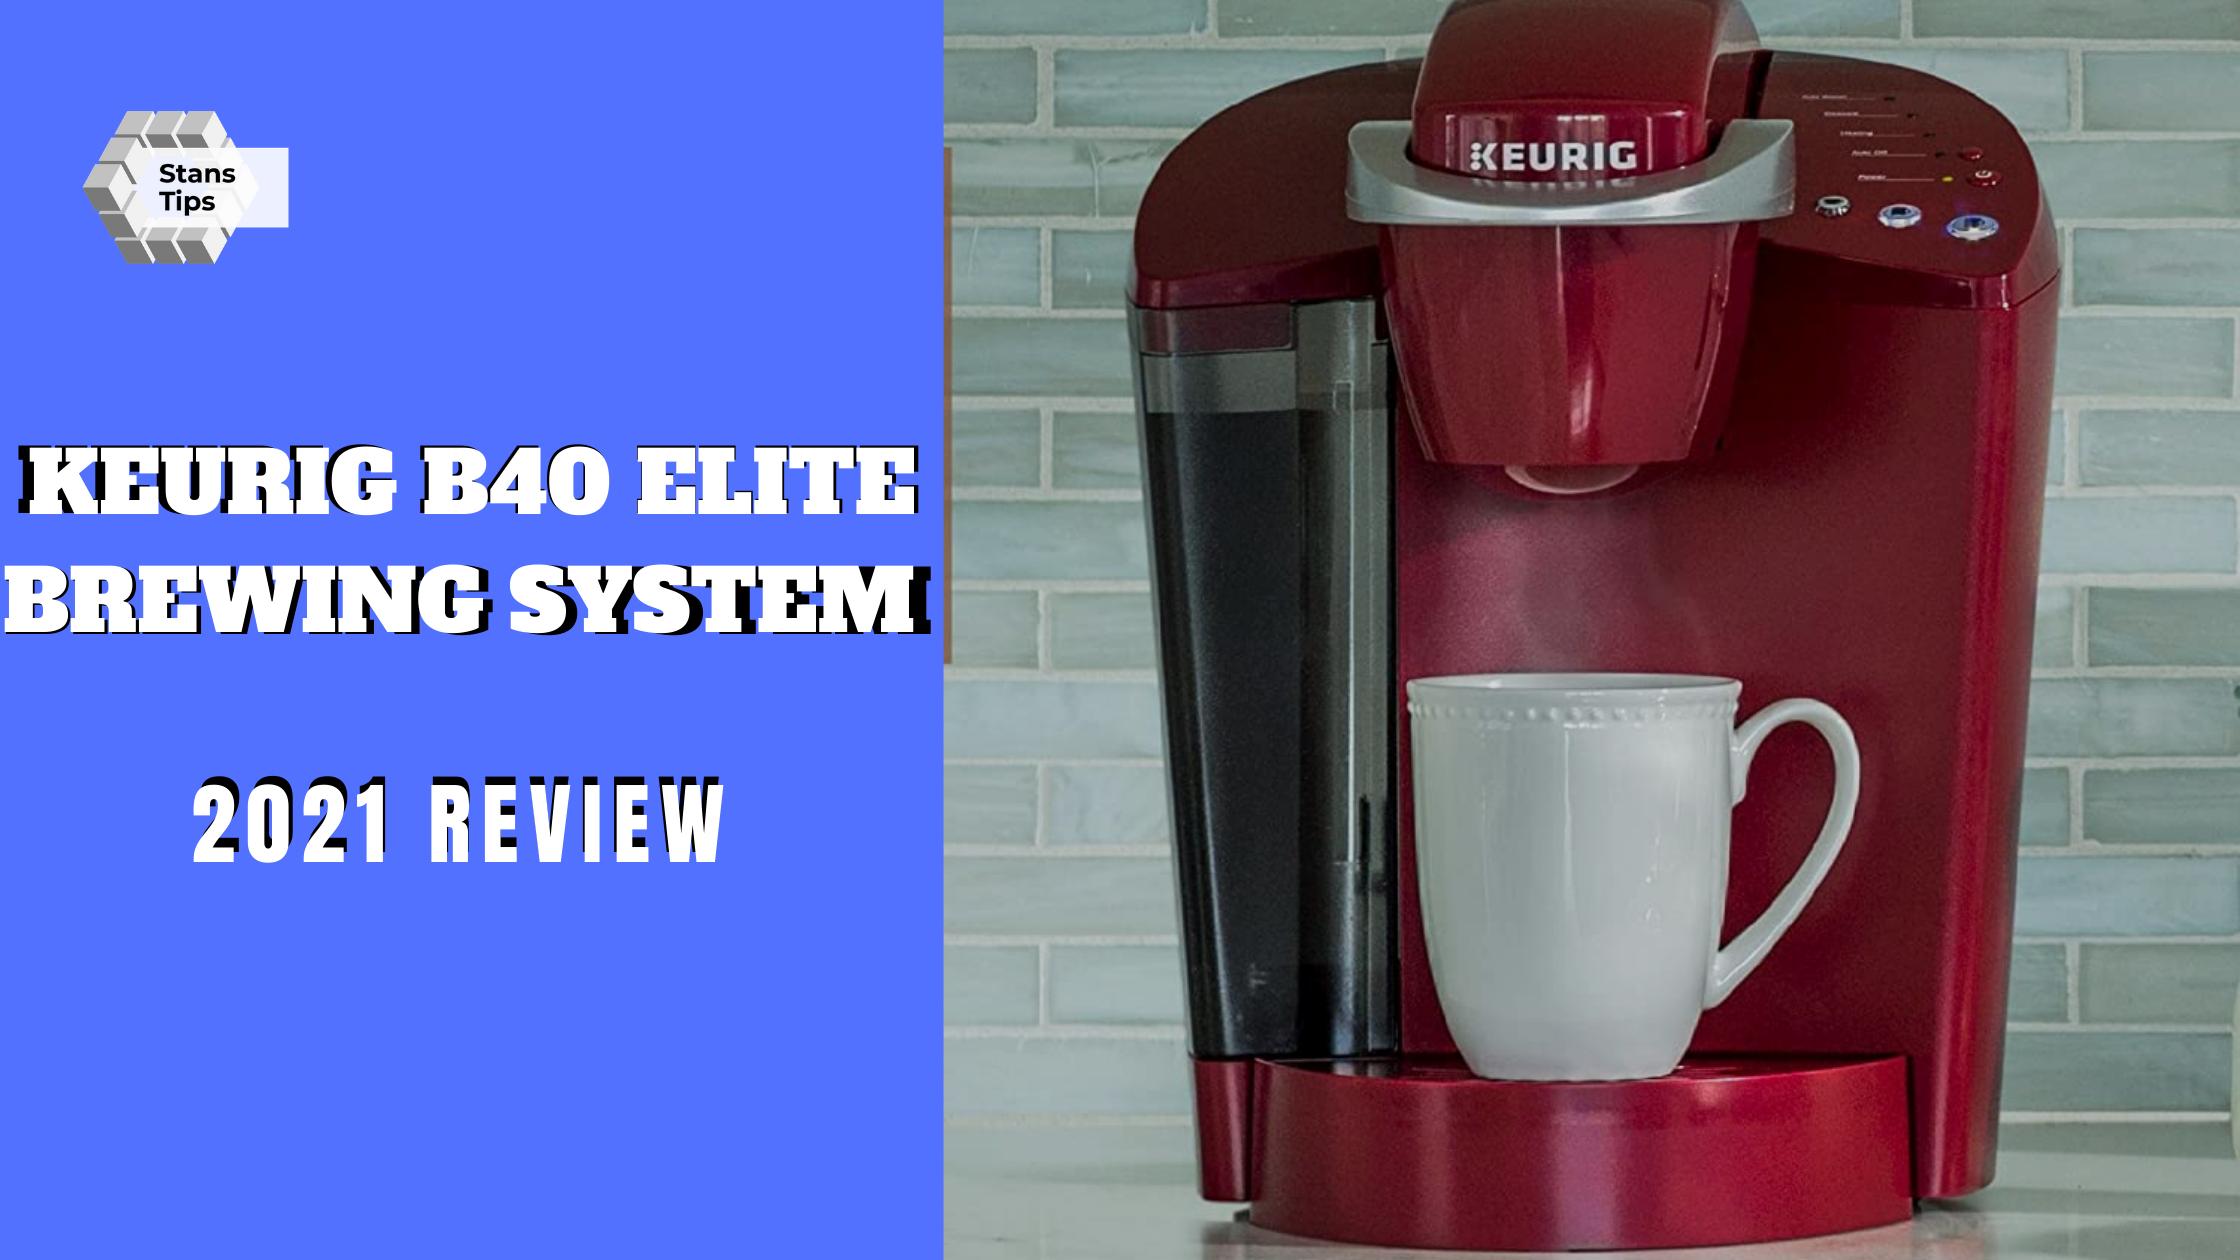 Keurig b40 elite brewing system review